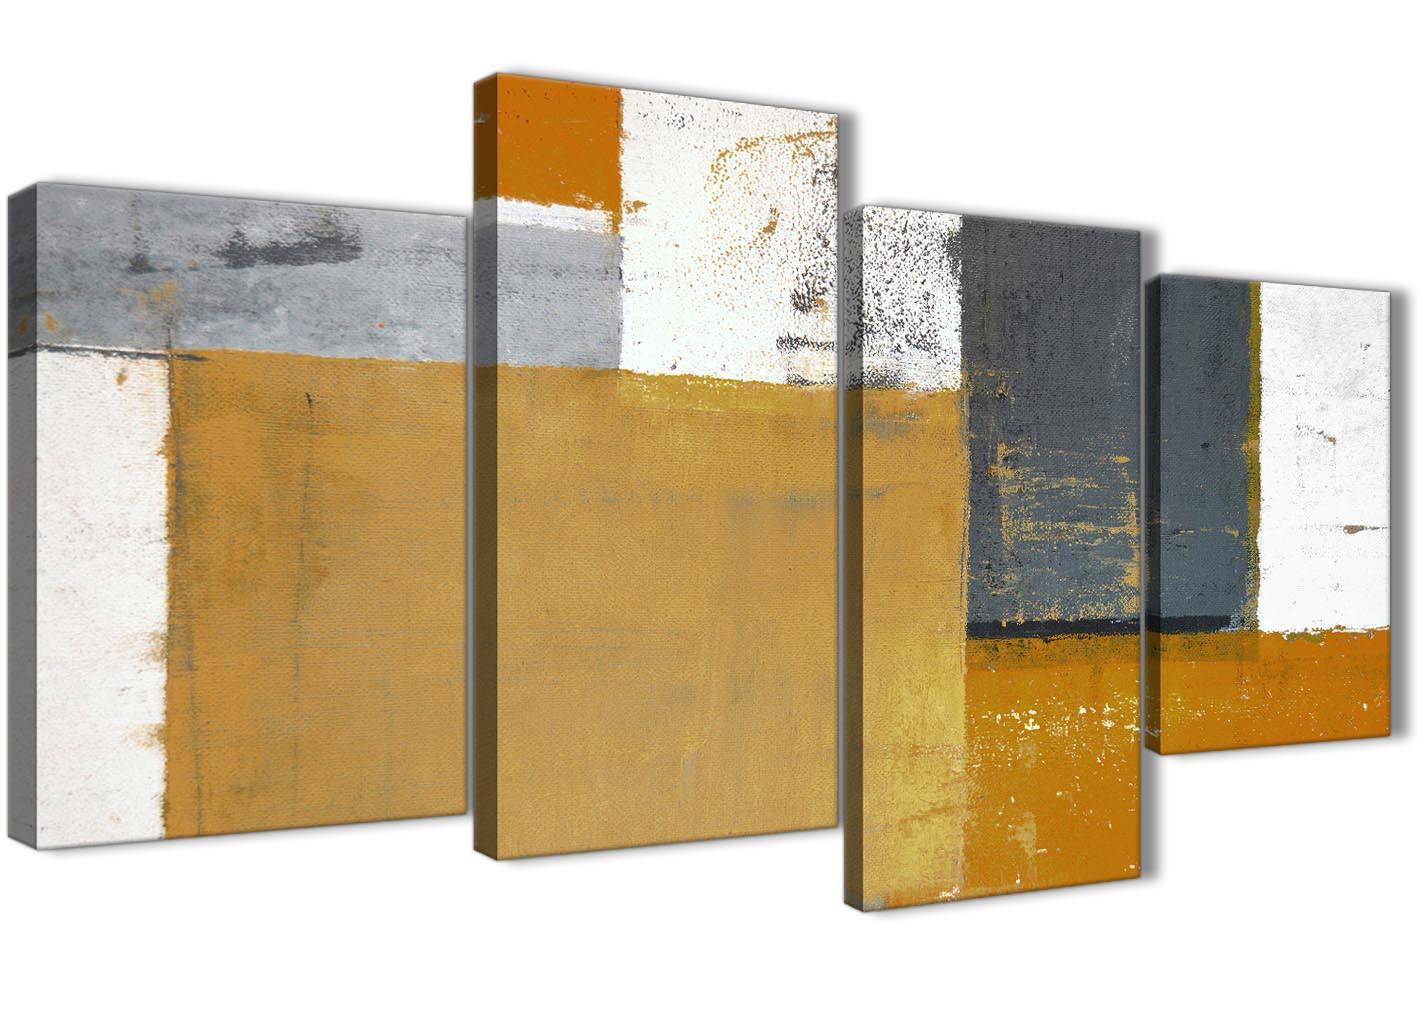 ecb2a4869fa Large Orange Grey Abstract Painting Canvas Wall Art Print .